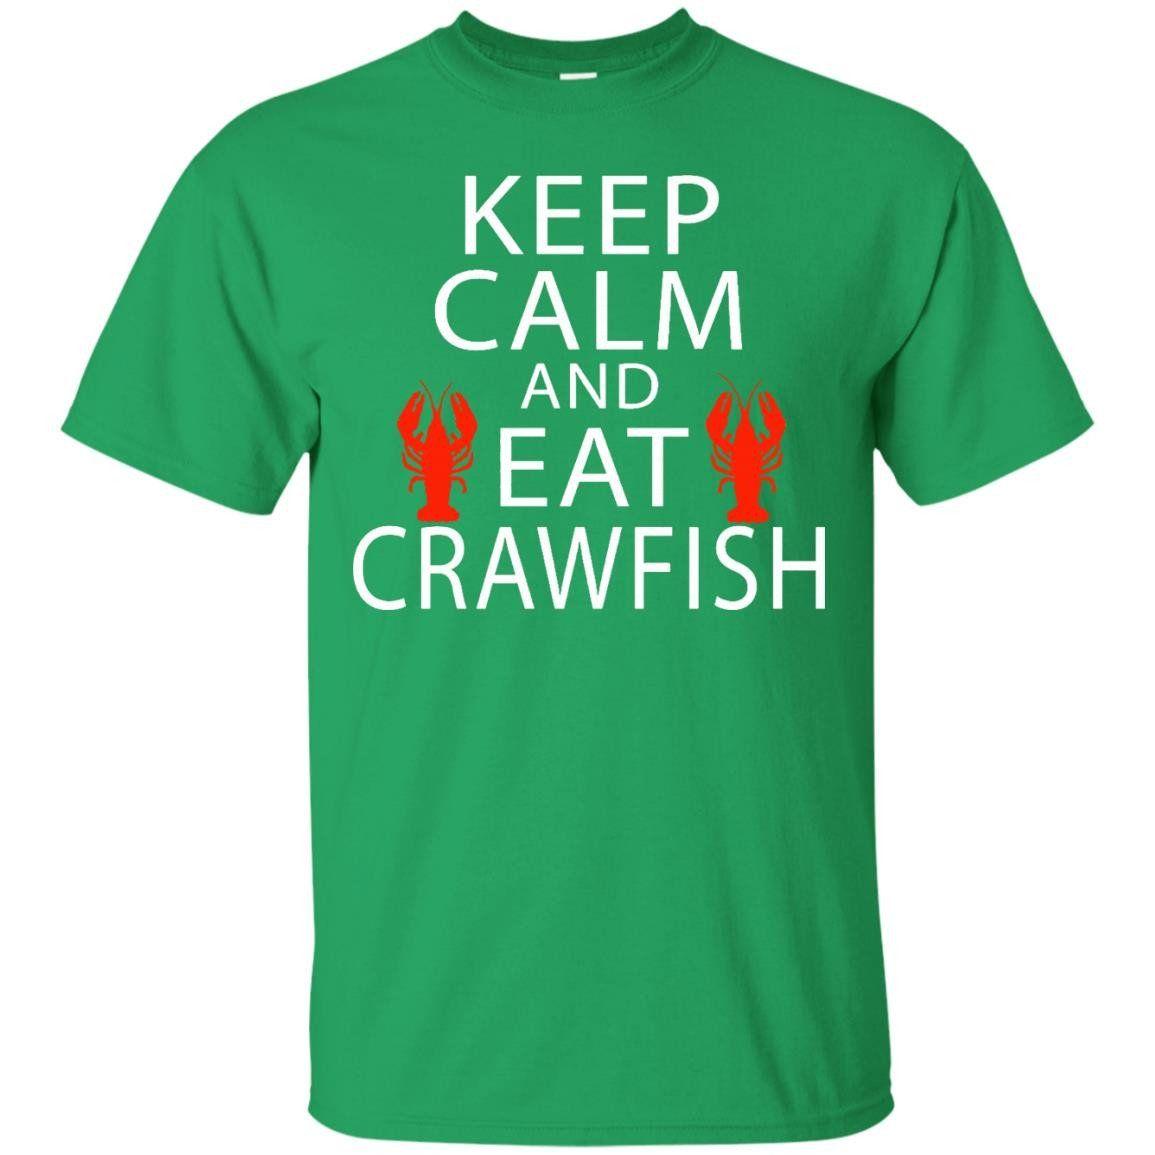 Keep Calm and Eat Crawfish Tshirt Boil Cajun NOLA